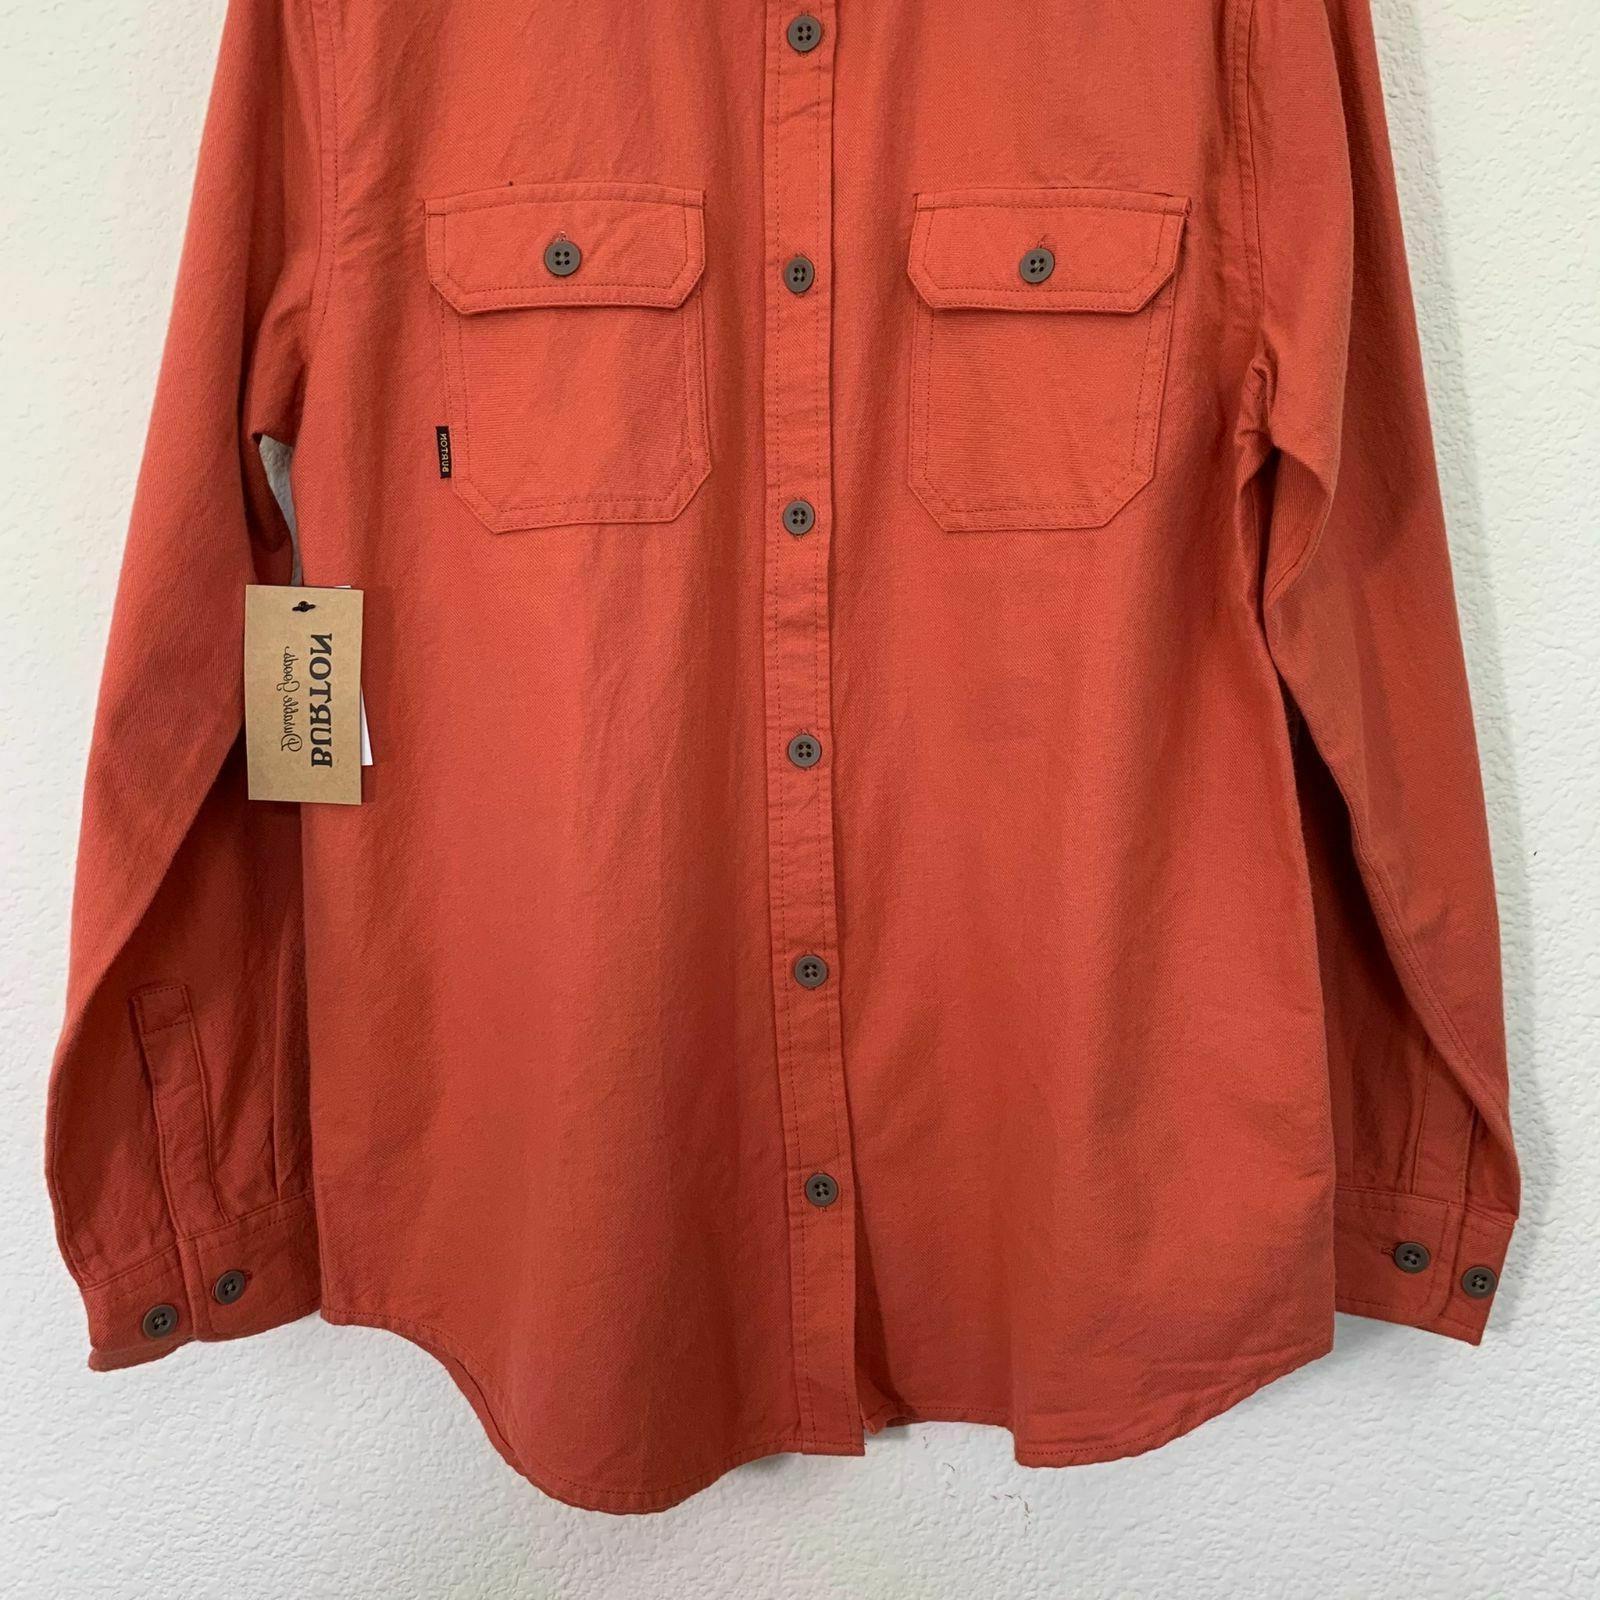 NWT Mens Small Brighton Button Long Shirt Sauce